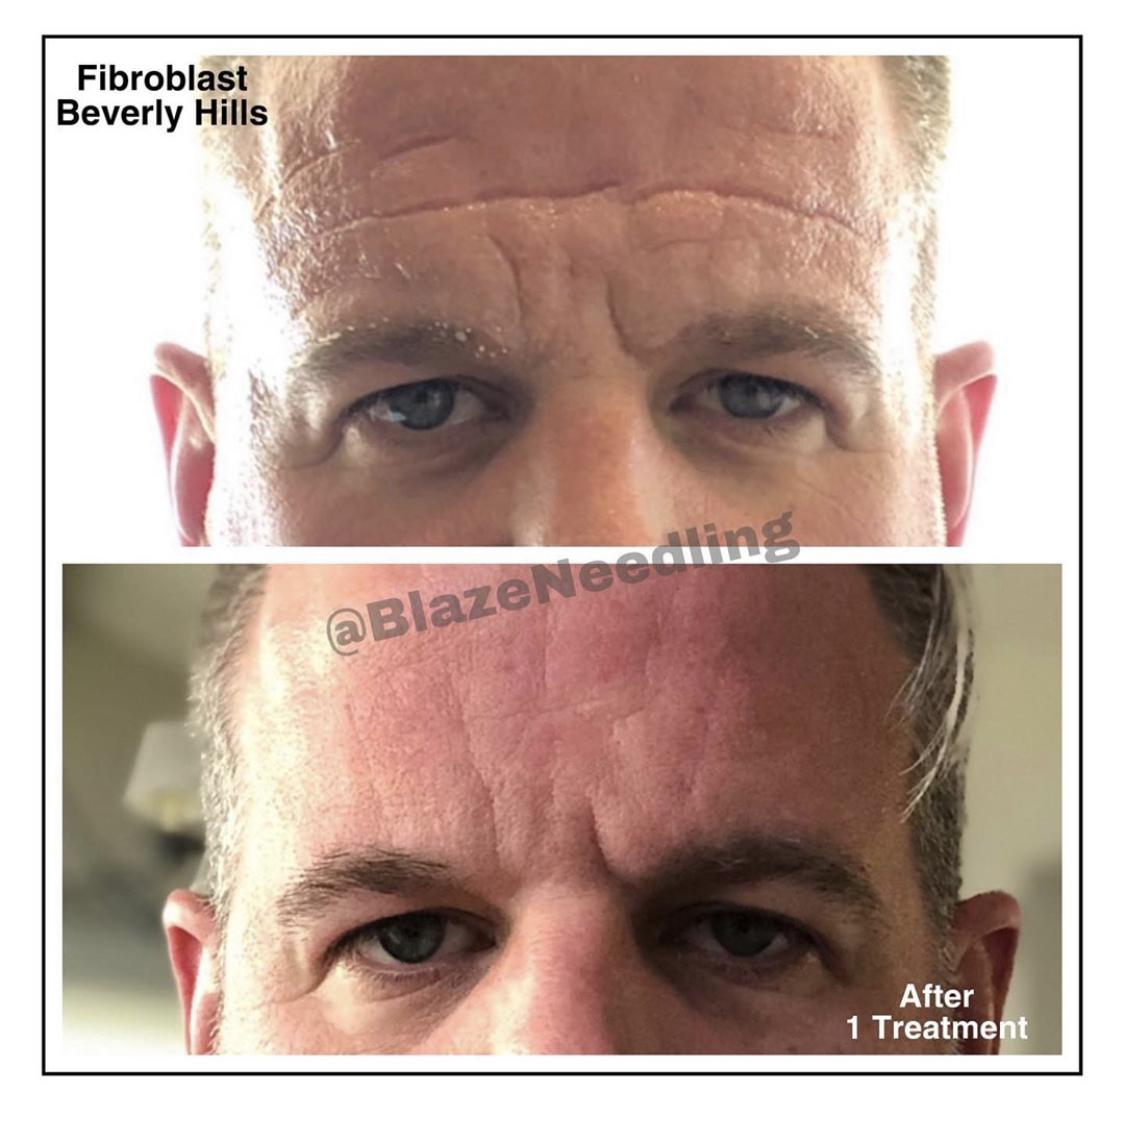 Fibroblast Forehead